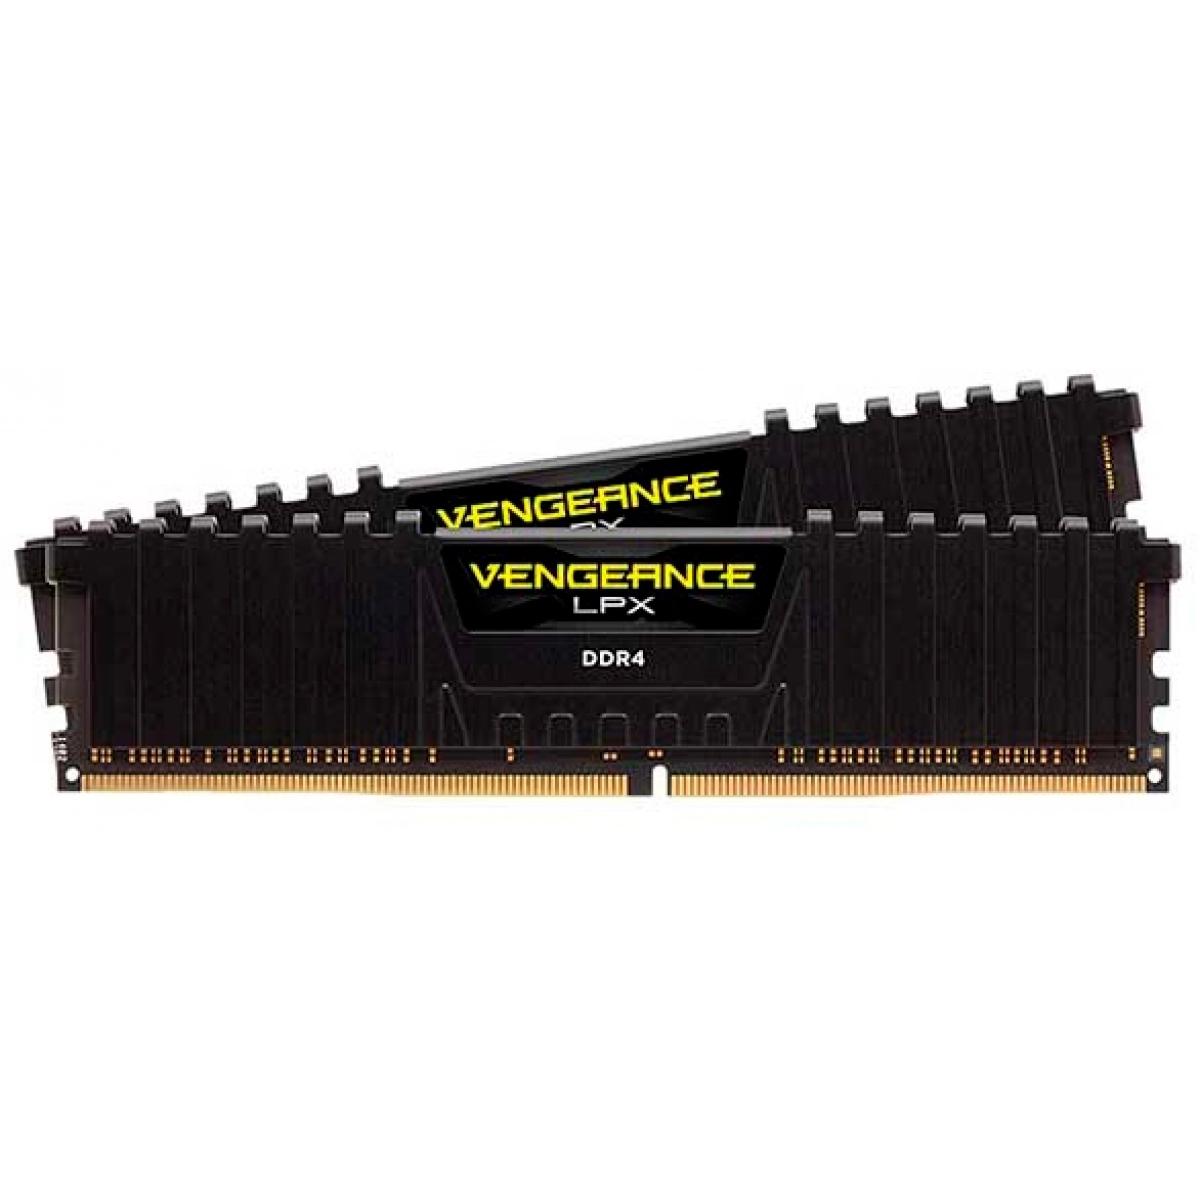 Memória DDR4 Corsair Vengeance LPX, 8GB (2x4GB) 2133MHz, Black, CMK8GX4M2A2133C13